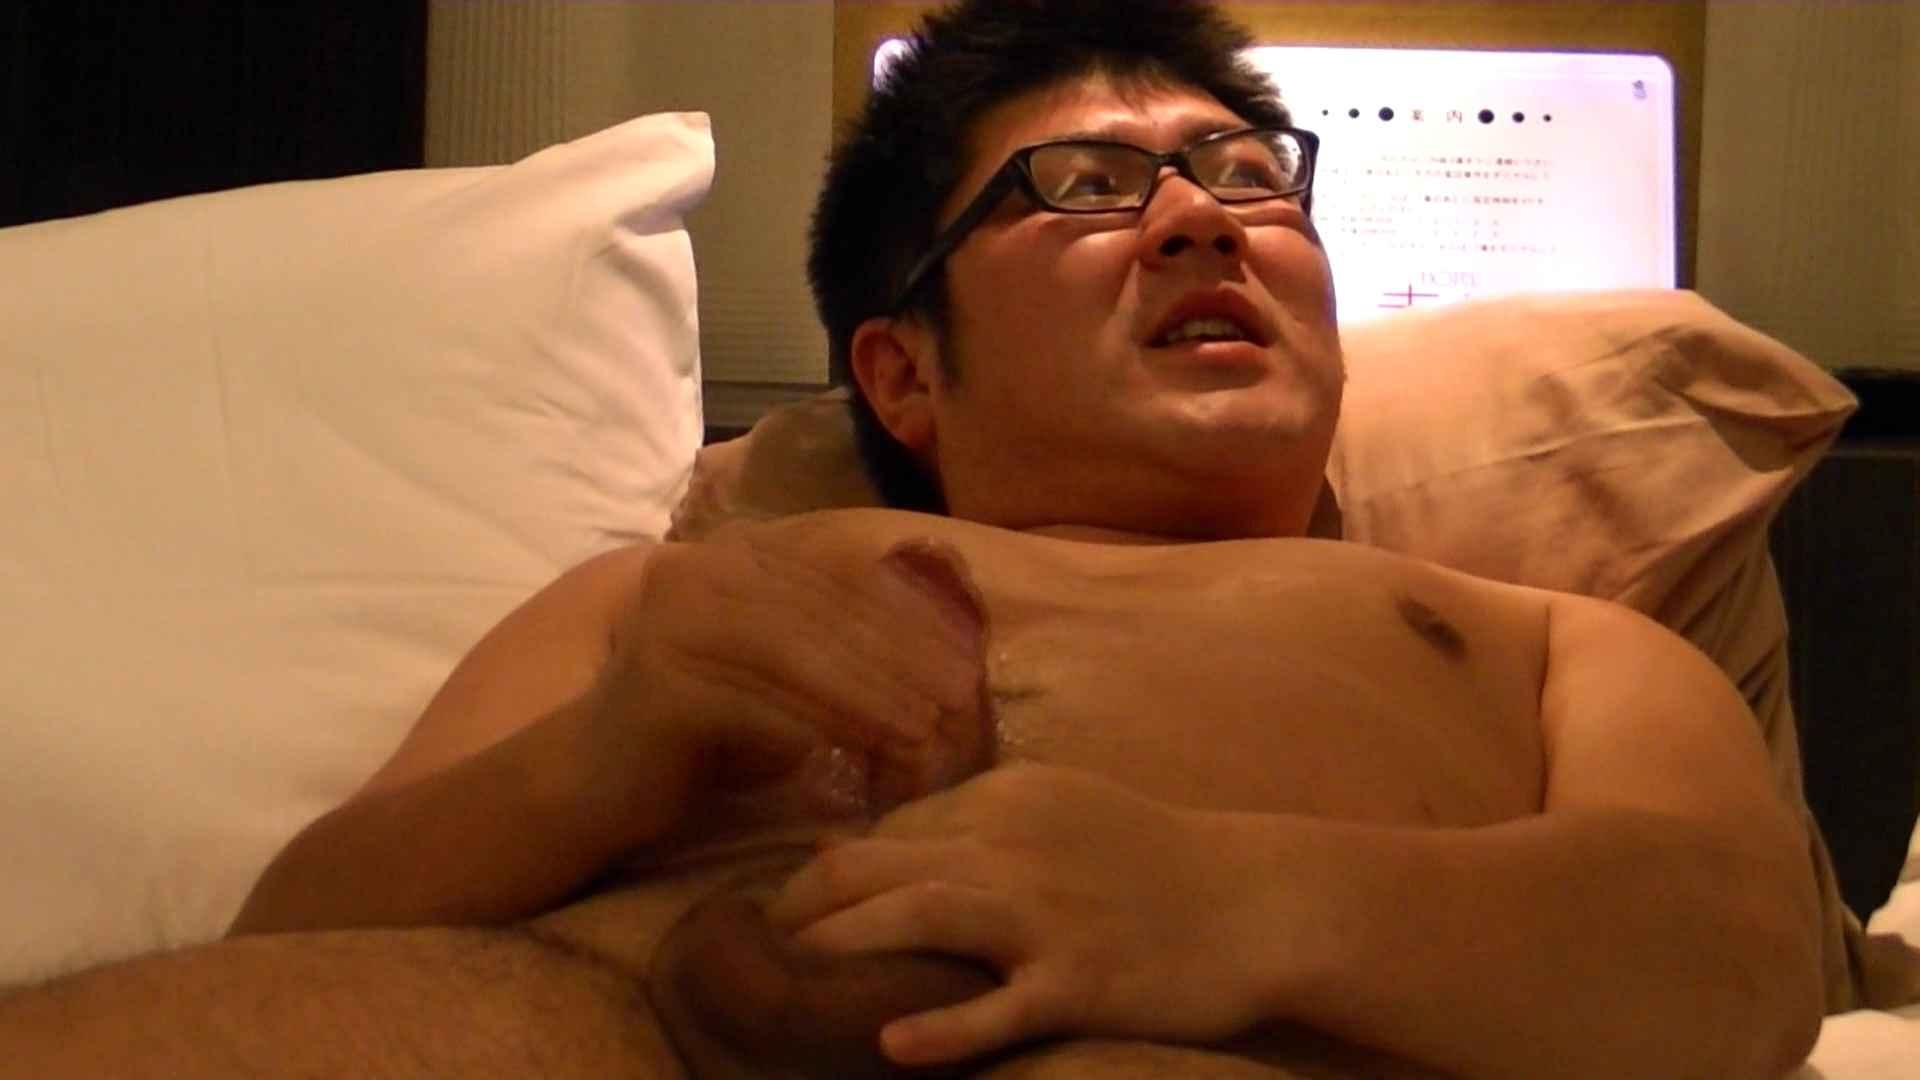 Mr.オナックスさん投稿!HD 貴方のオナニー三万円で撮影させてください。VOL.03 後編 完全無修正でお届け | オナニー特集  83pic 80